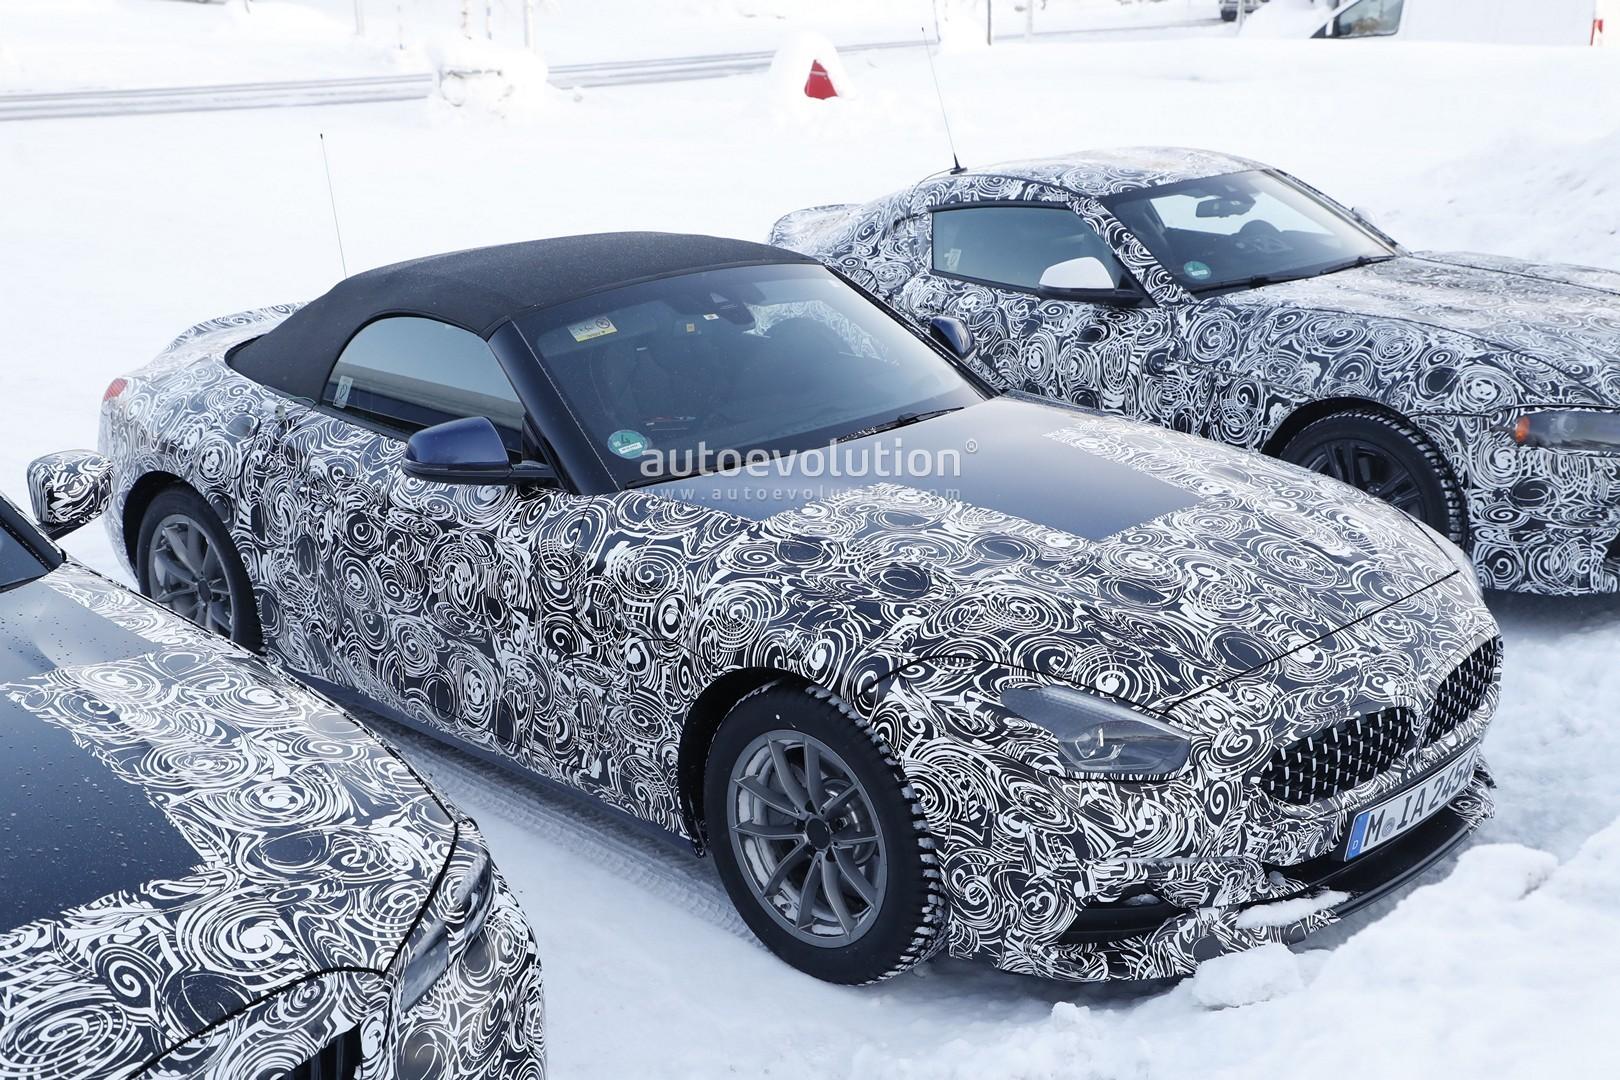 2019 Bmw Z4 Spied Next To Toyota Supra And Next 3 Series Sedan Autoevolution